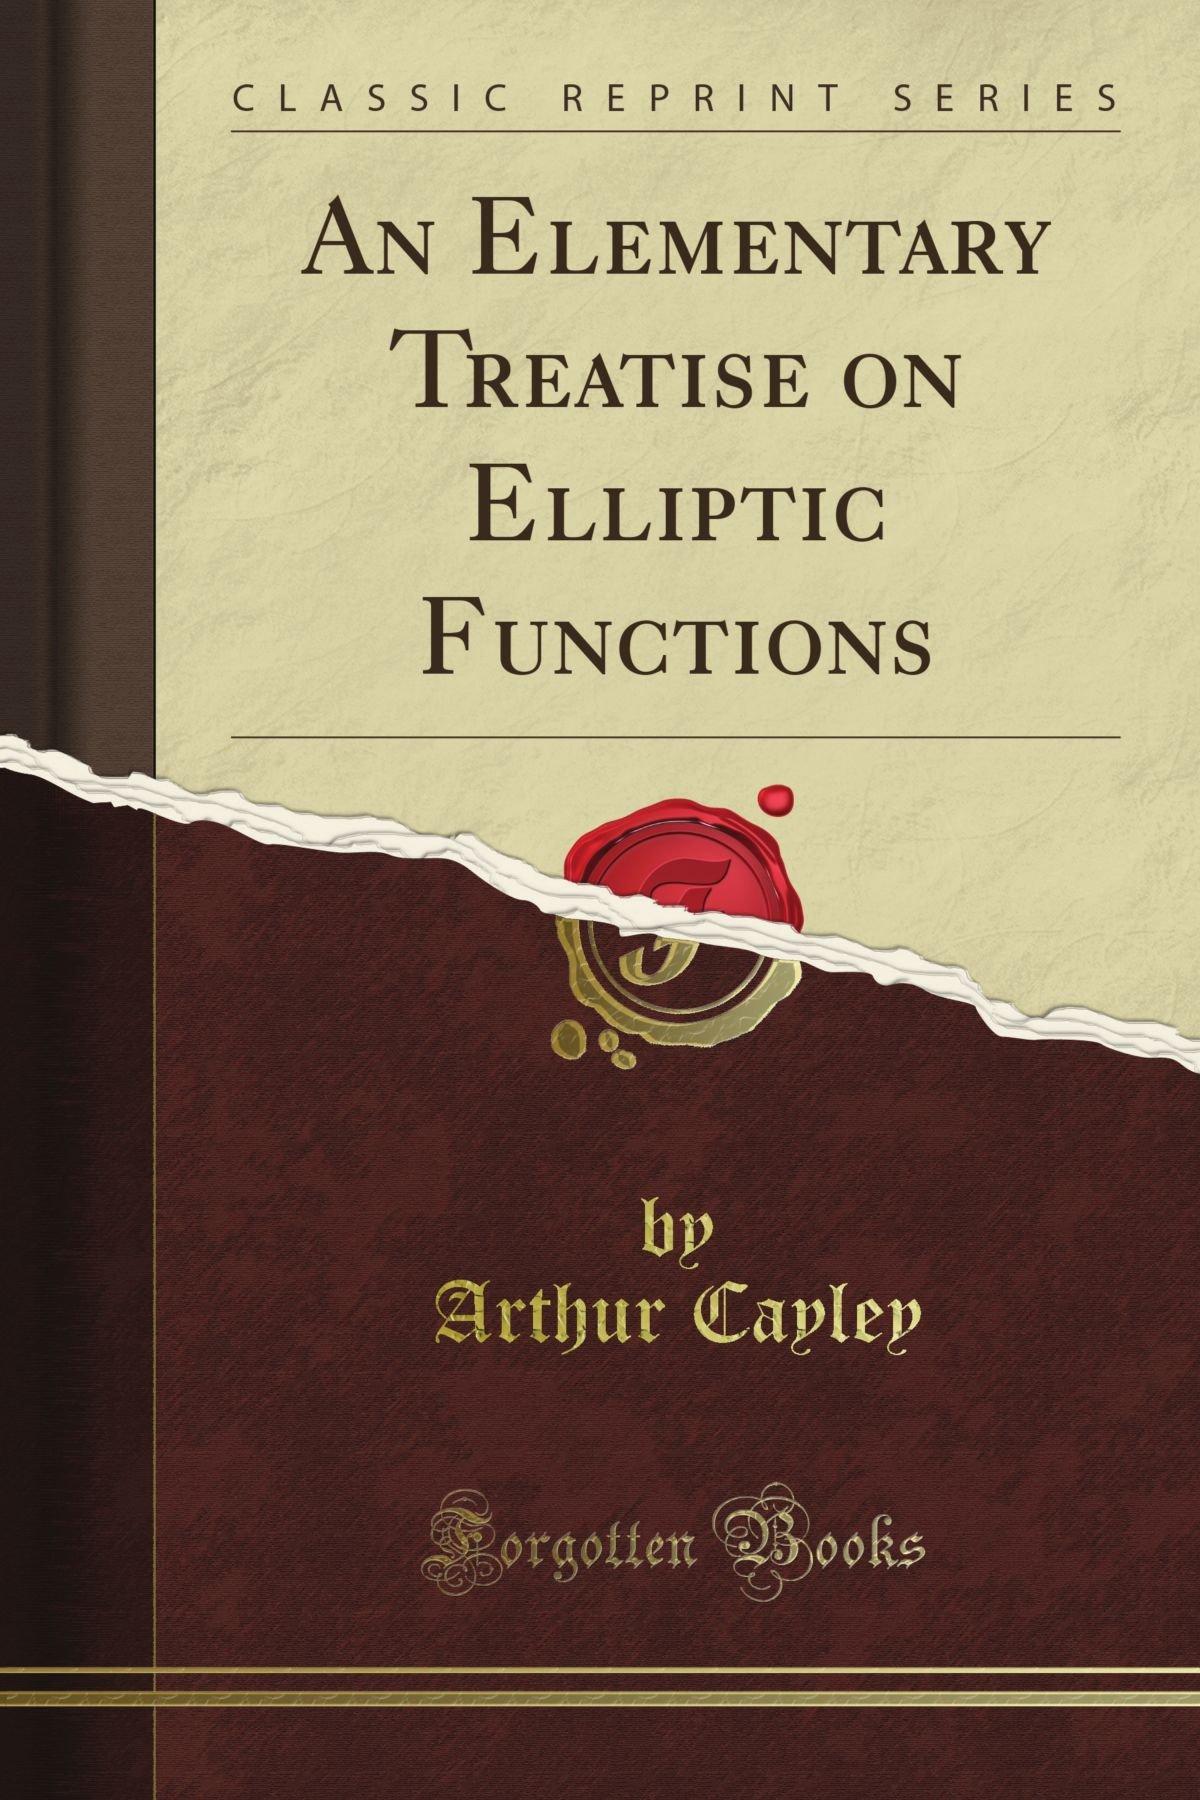 An elementary treatise on elliptic functions